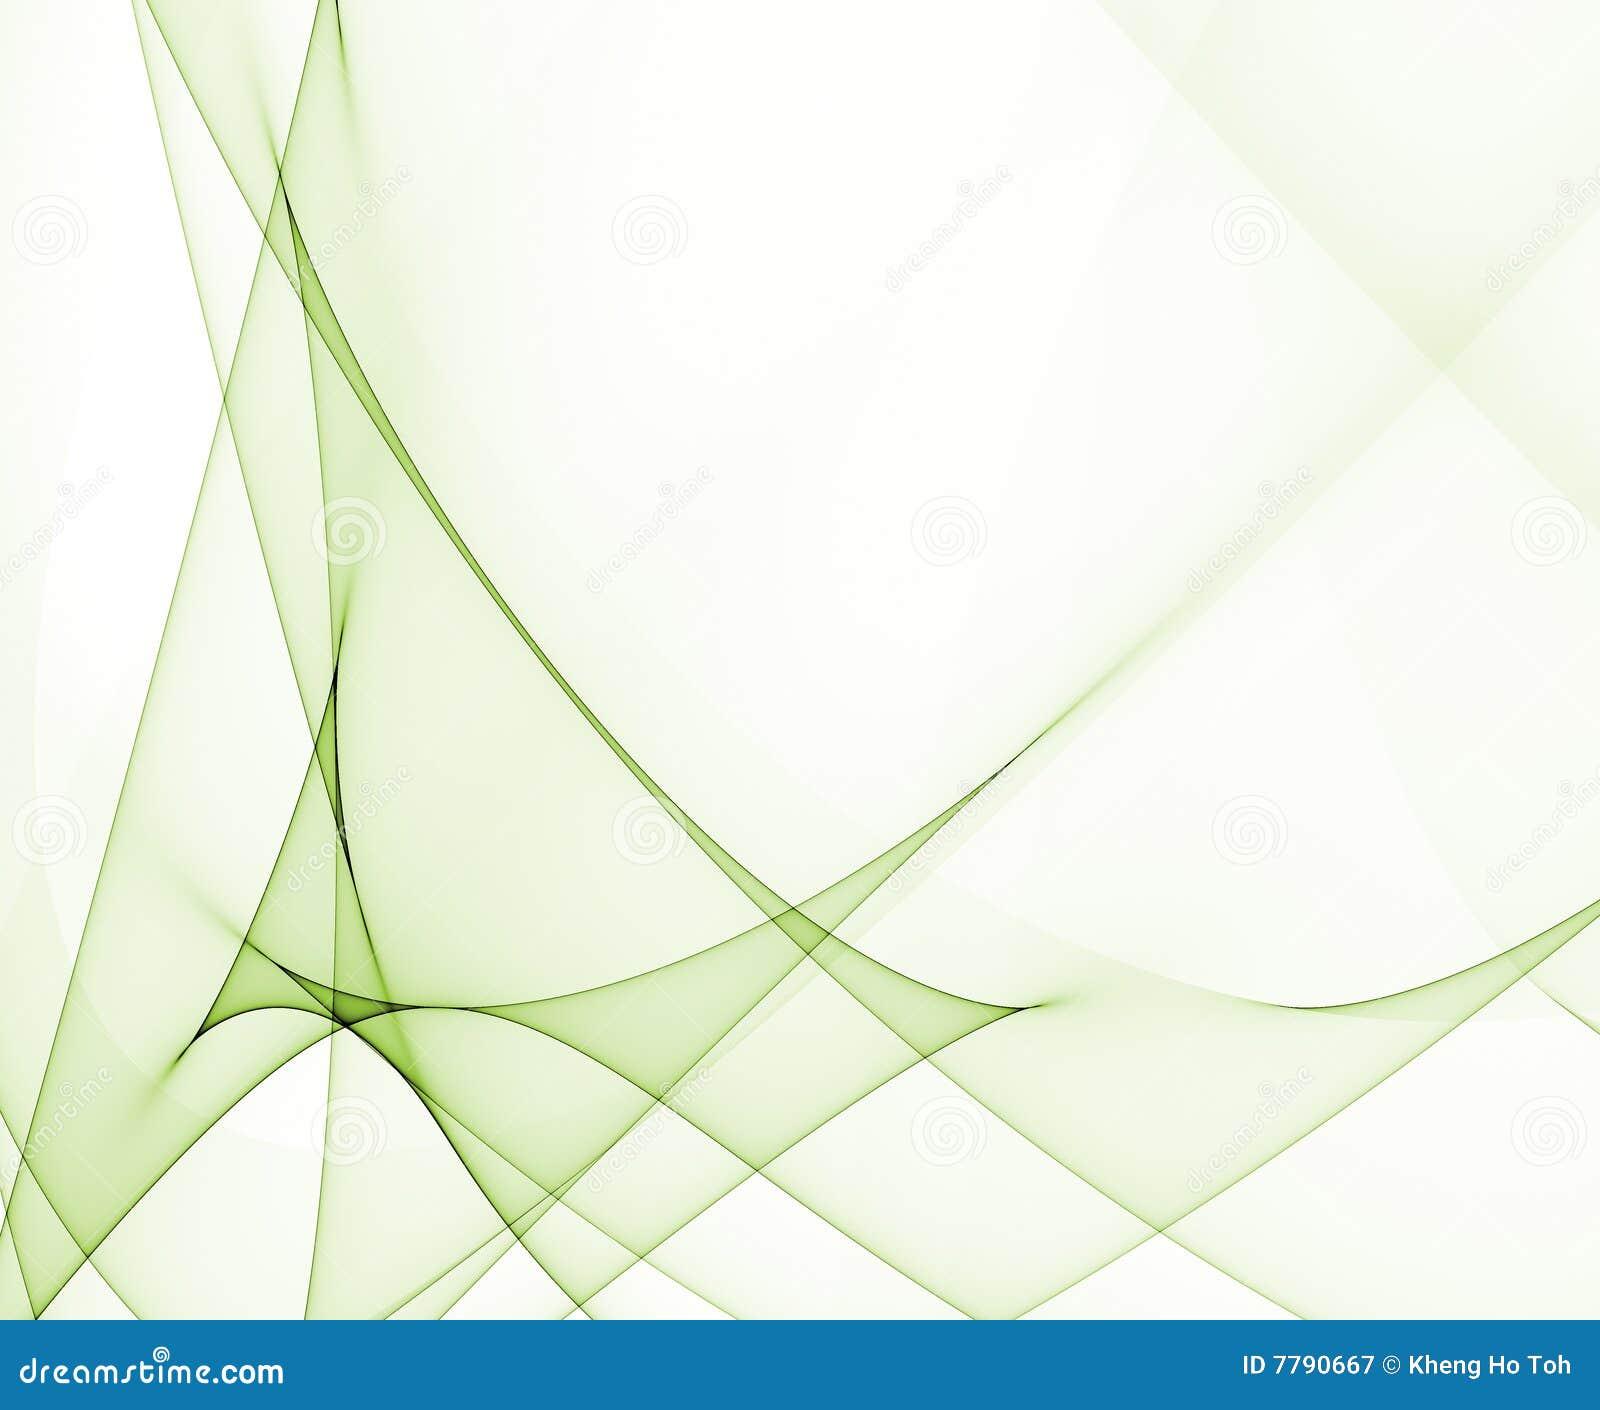 Digital photo presentation software google